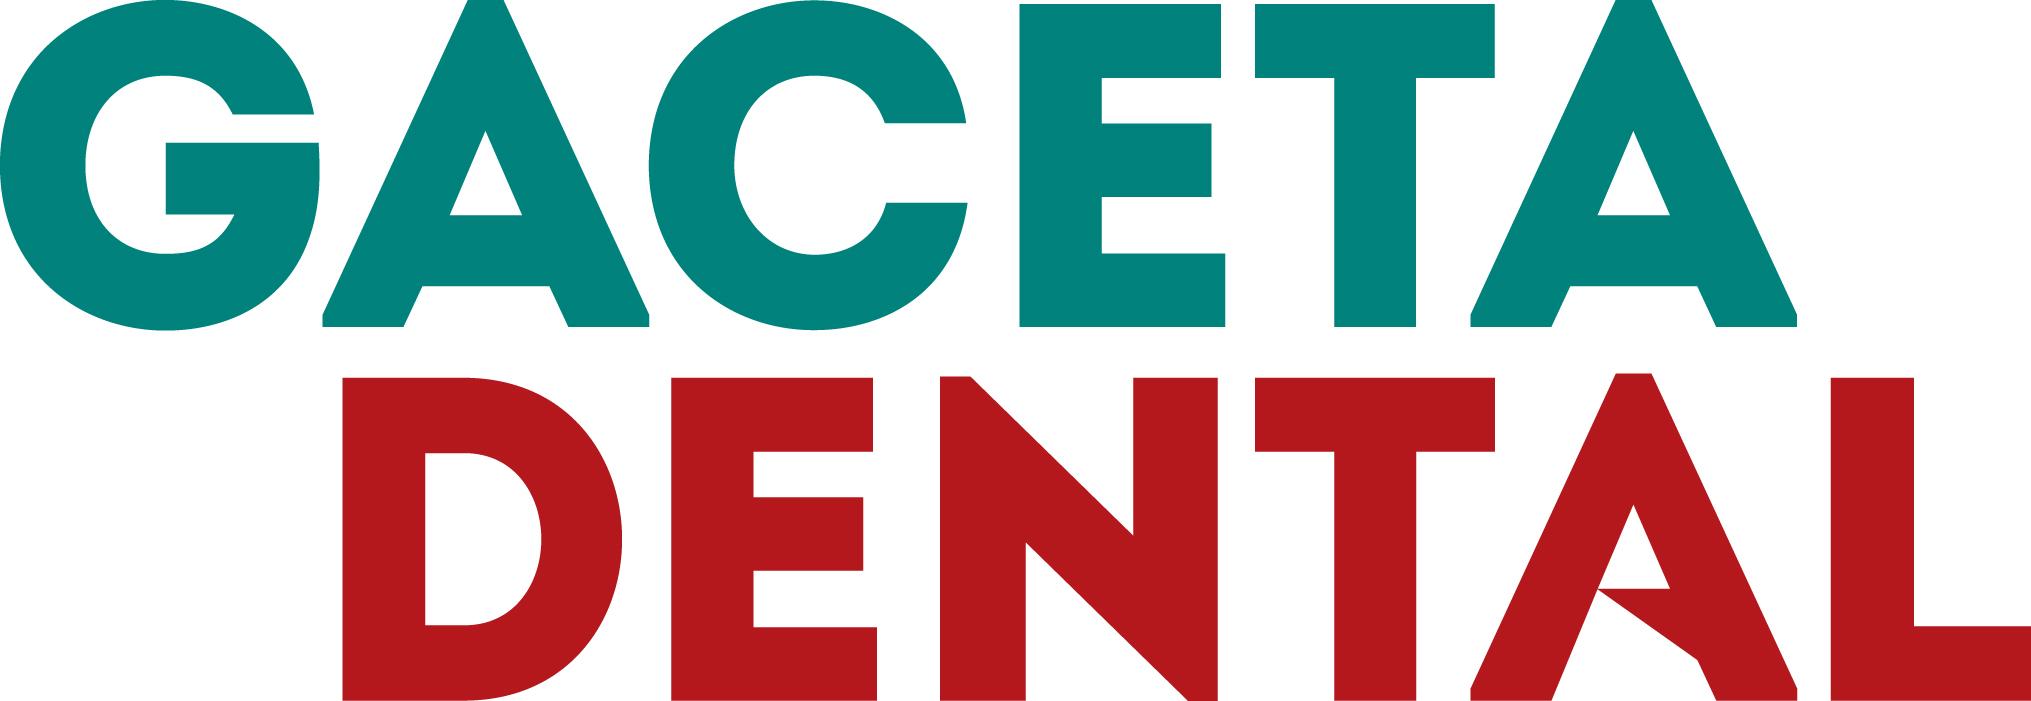 Logotipo Gaceta Dental